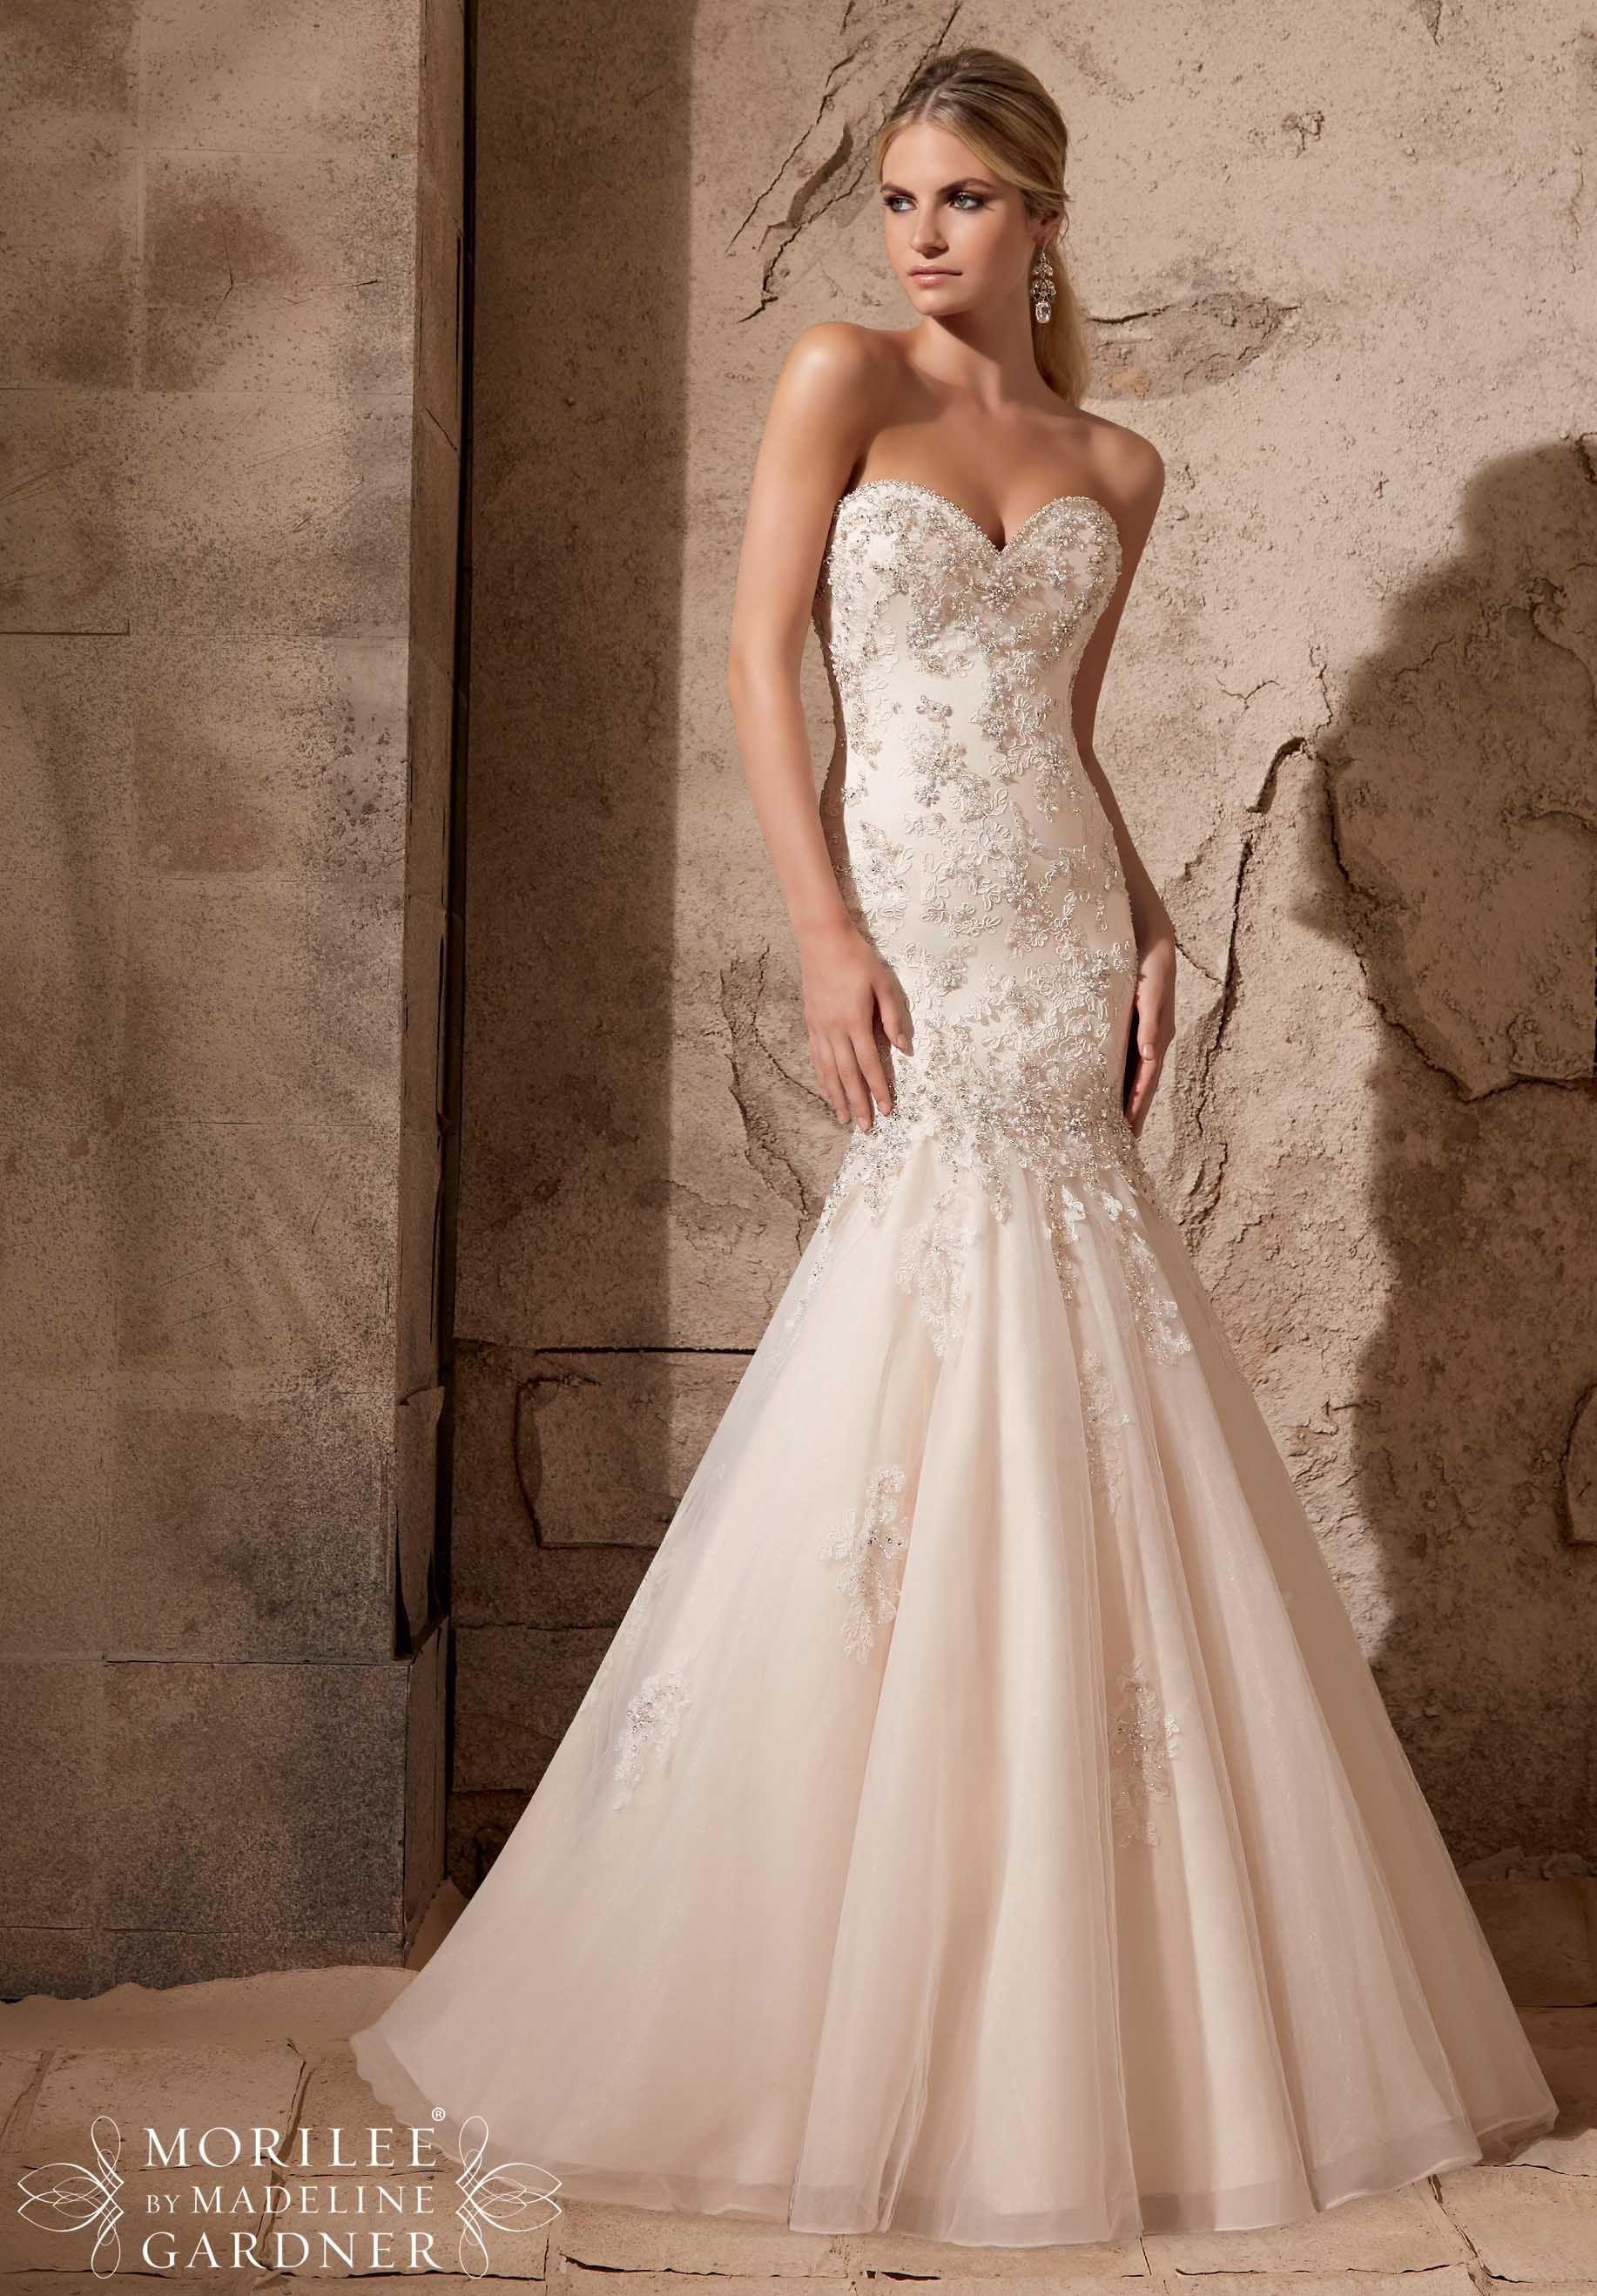 Wedding Bridal Gowns Designer Morilee Wedding Dress Style 2720 Mori Lee Wedding Dress Designer Bridal Gowns Wedding Dress Organza